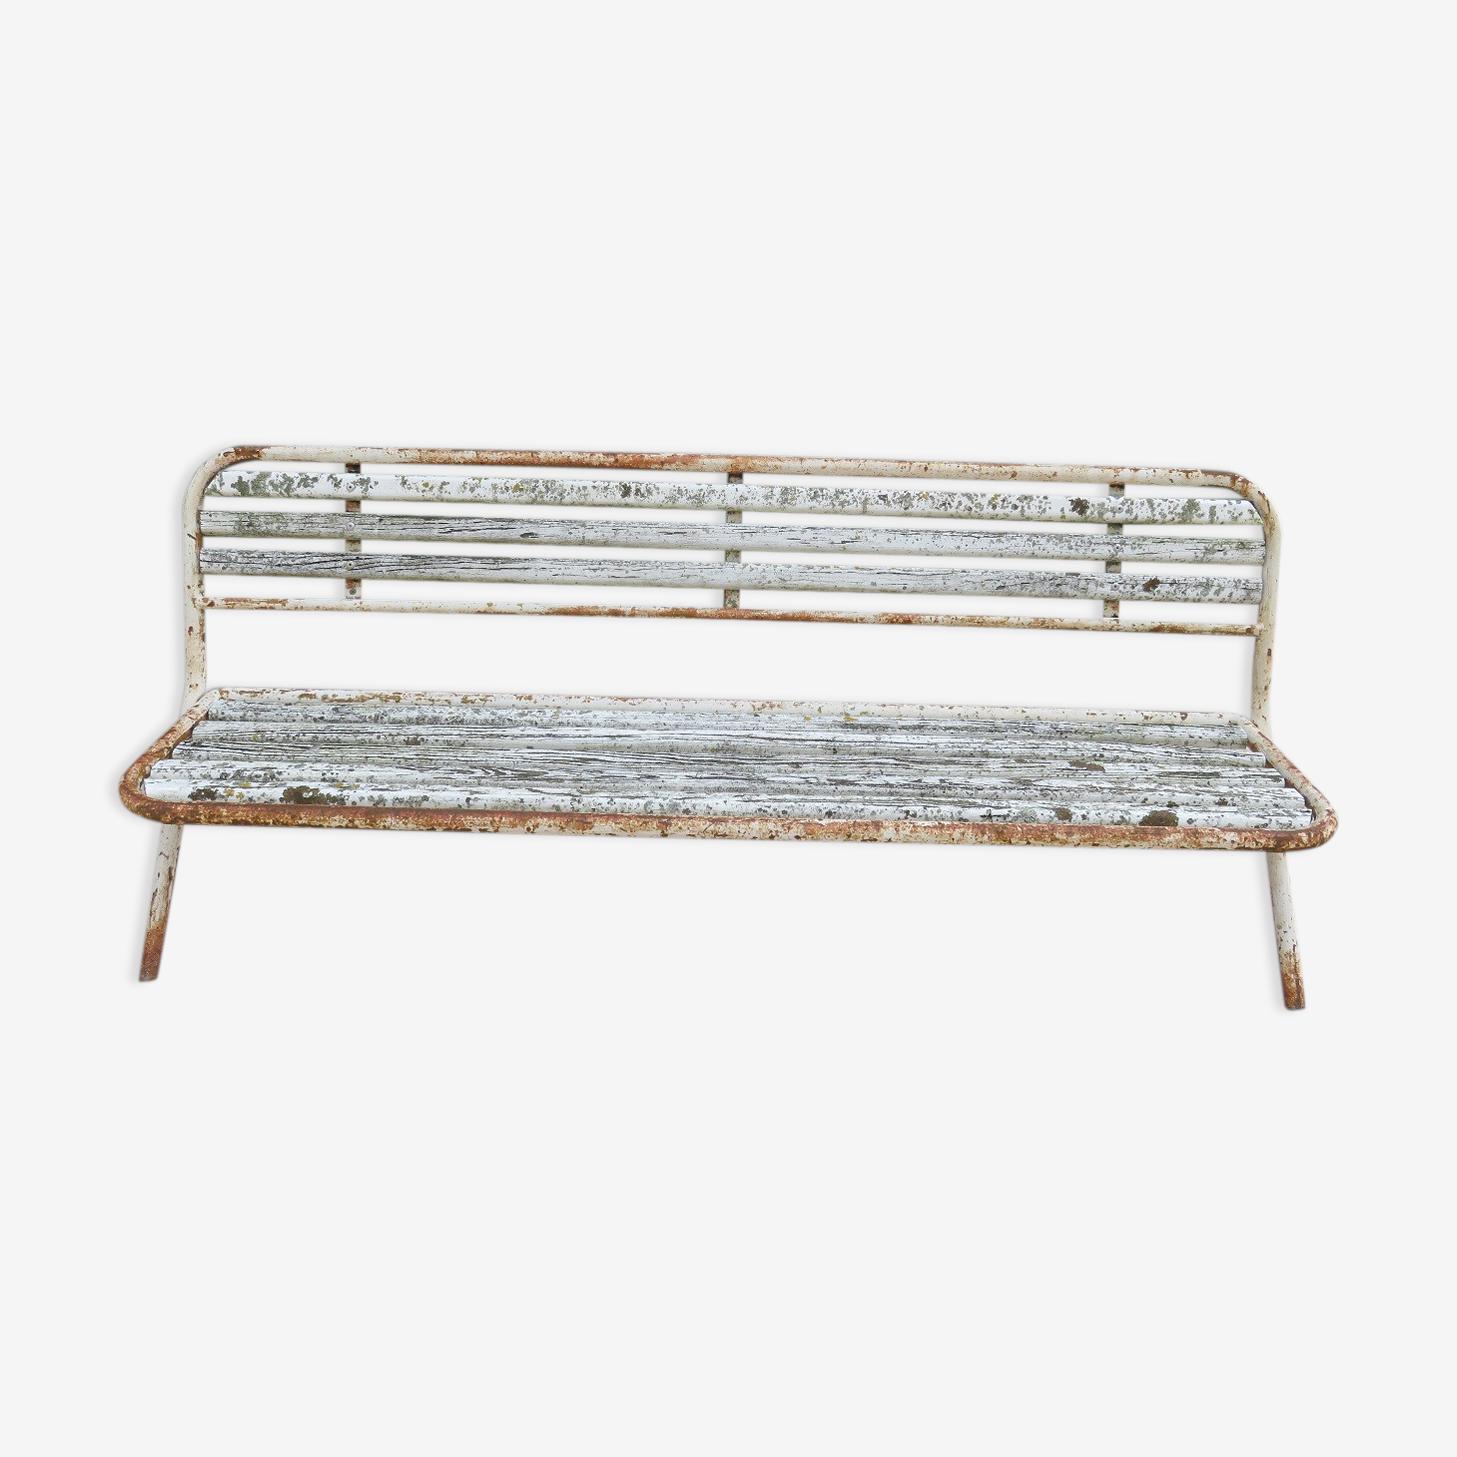 Folding garden bench